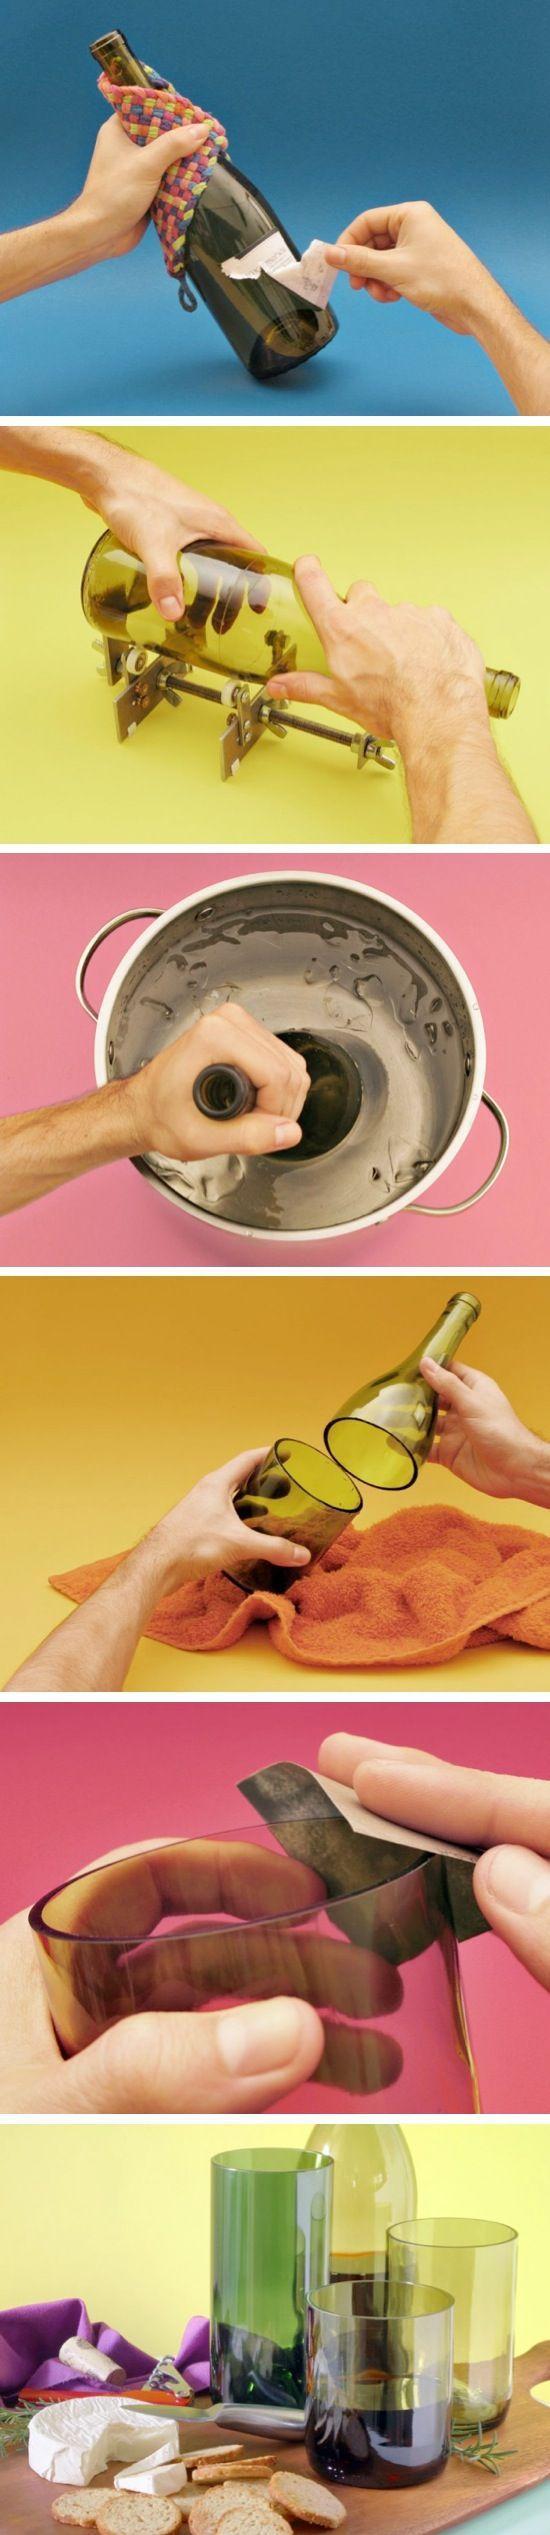 DIY Wine Bottle Tumblers